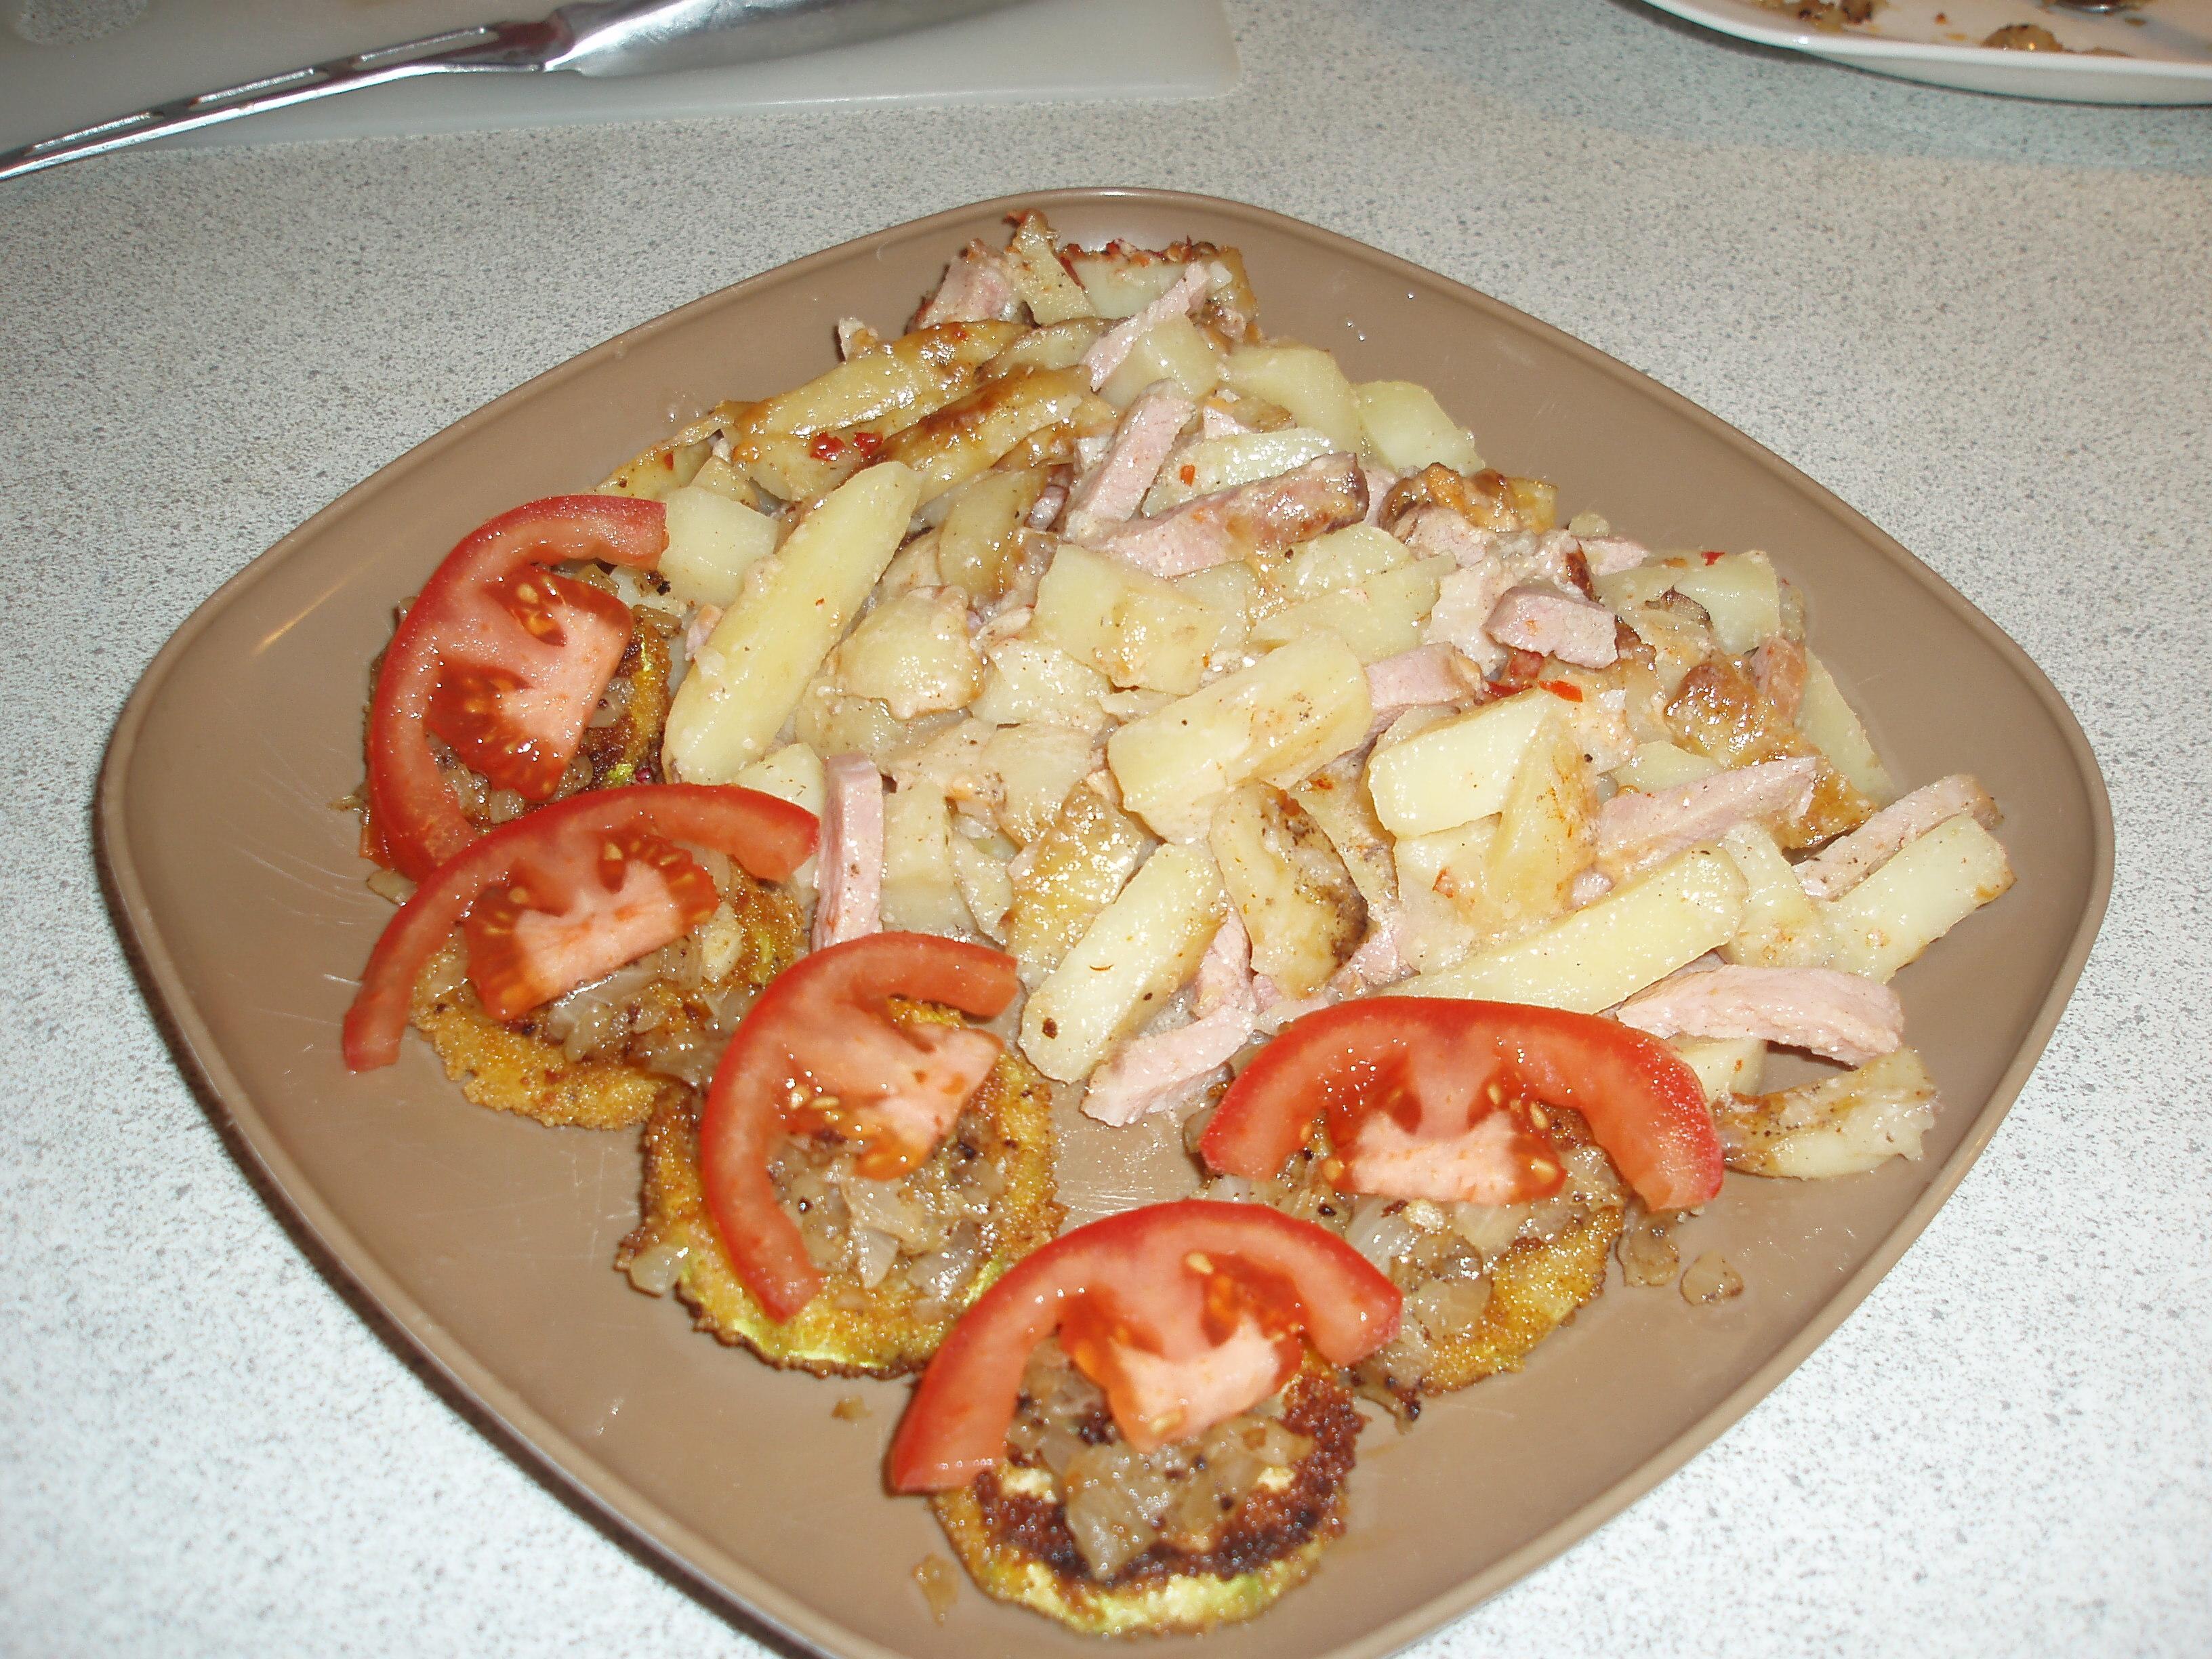 skinka/kassler/korv och potatislåda